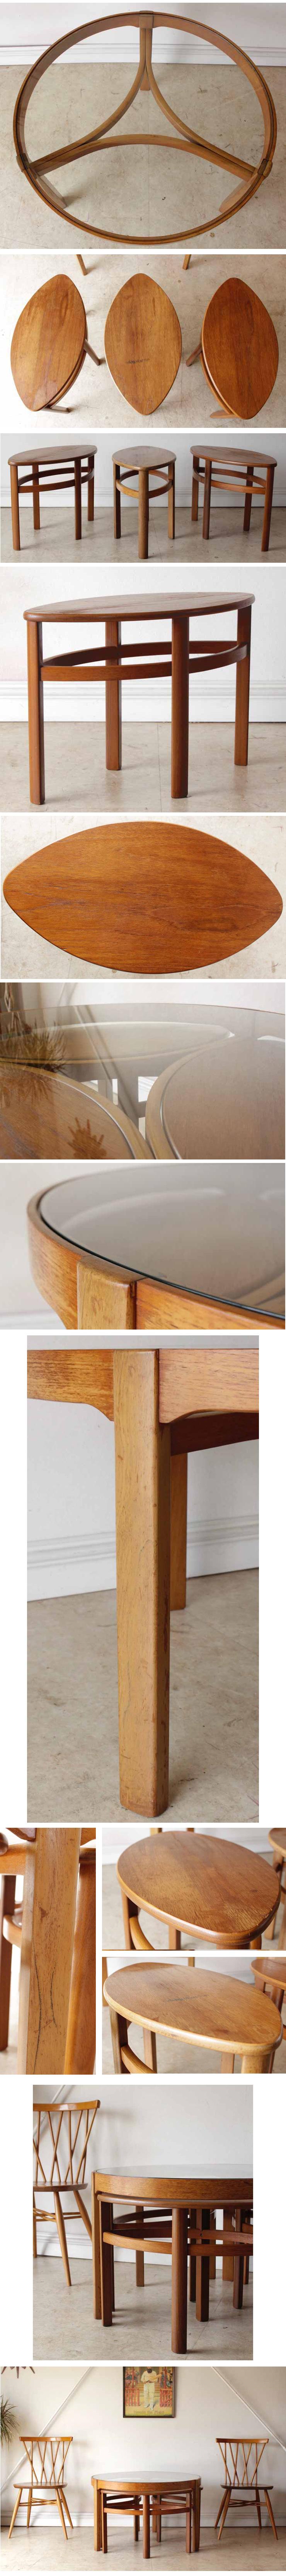 Nathanネイサン製ガラス天板ネストテーブル【チーク】イギリス製ビンテージ/ミッドセンチュリー輸入アンティーク家具